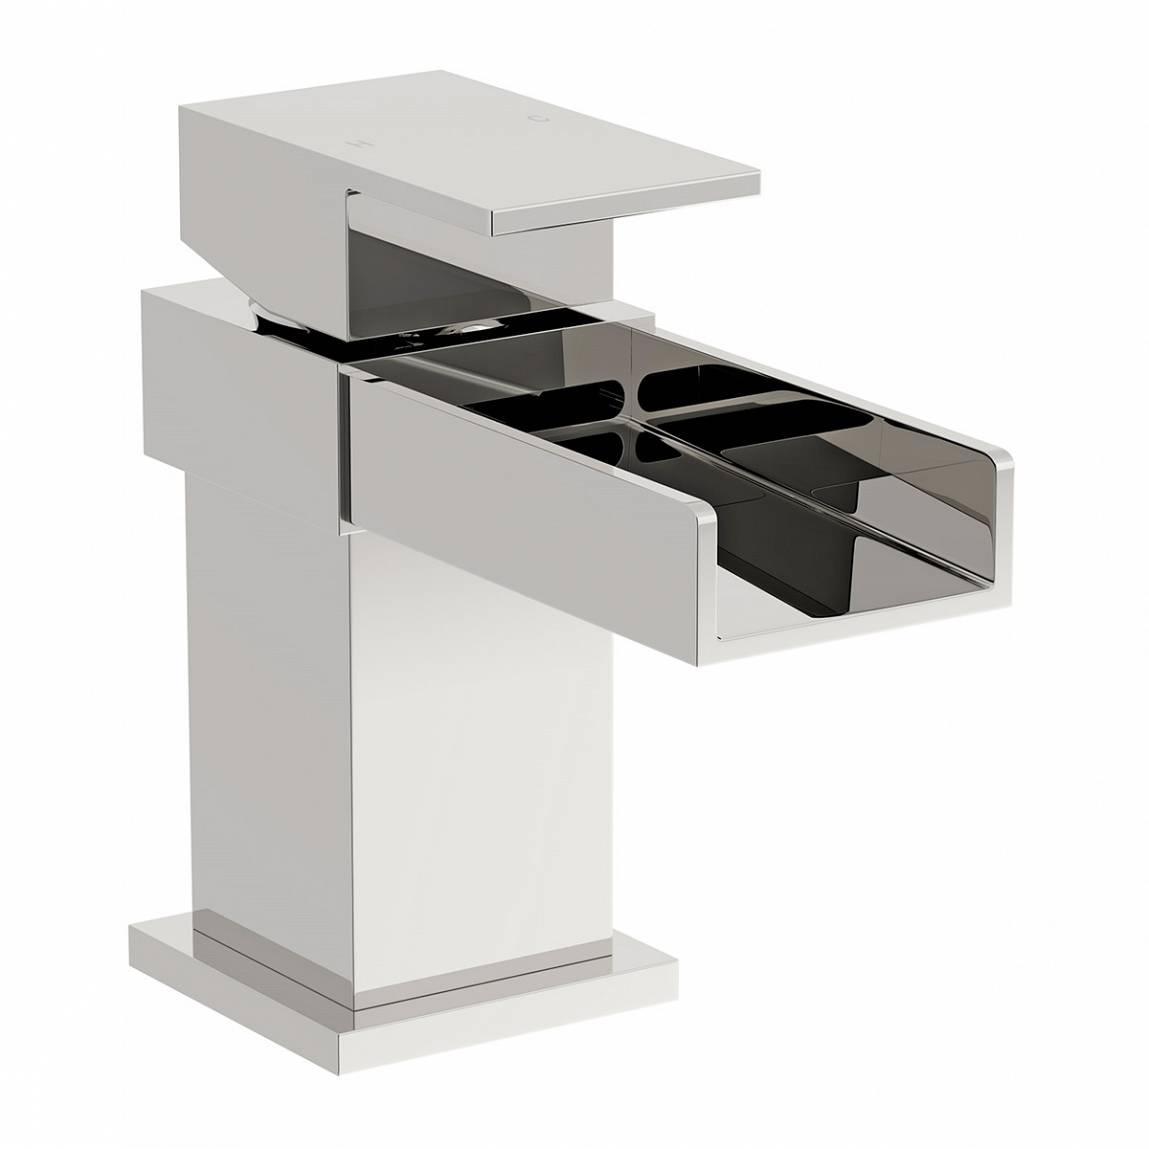 Image of Metro Waterfall Cloakroom Basin Mixer